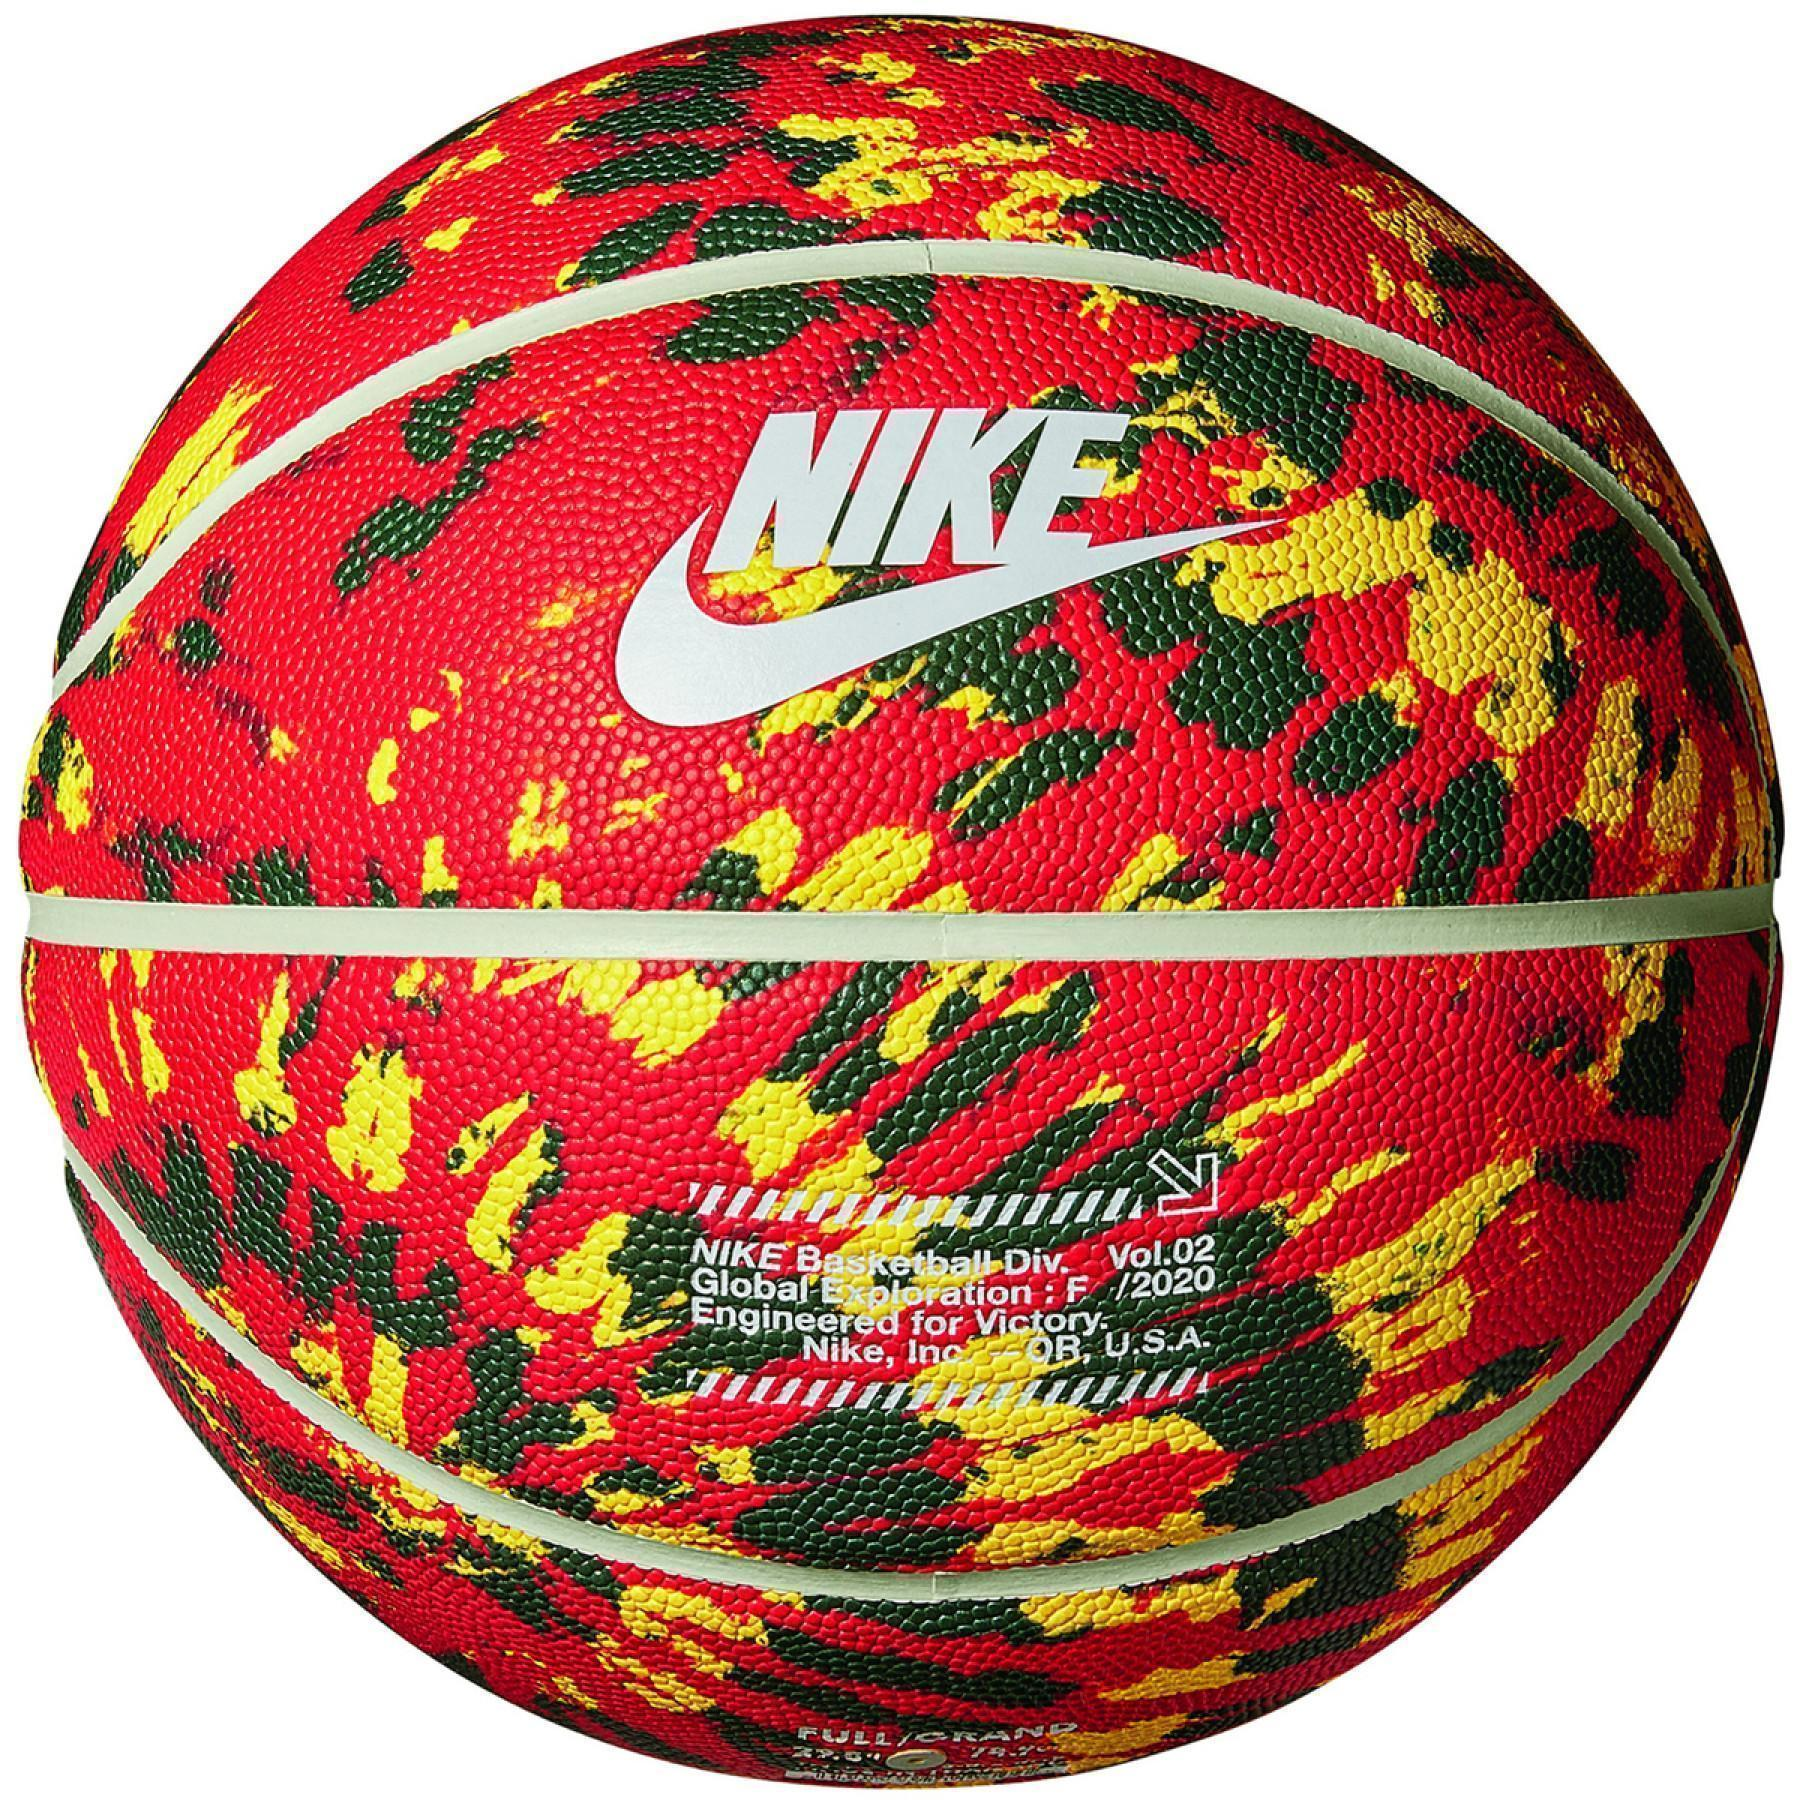 Nike global basketball - west